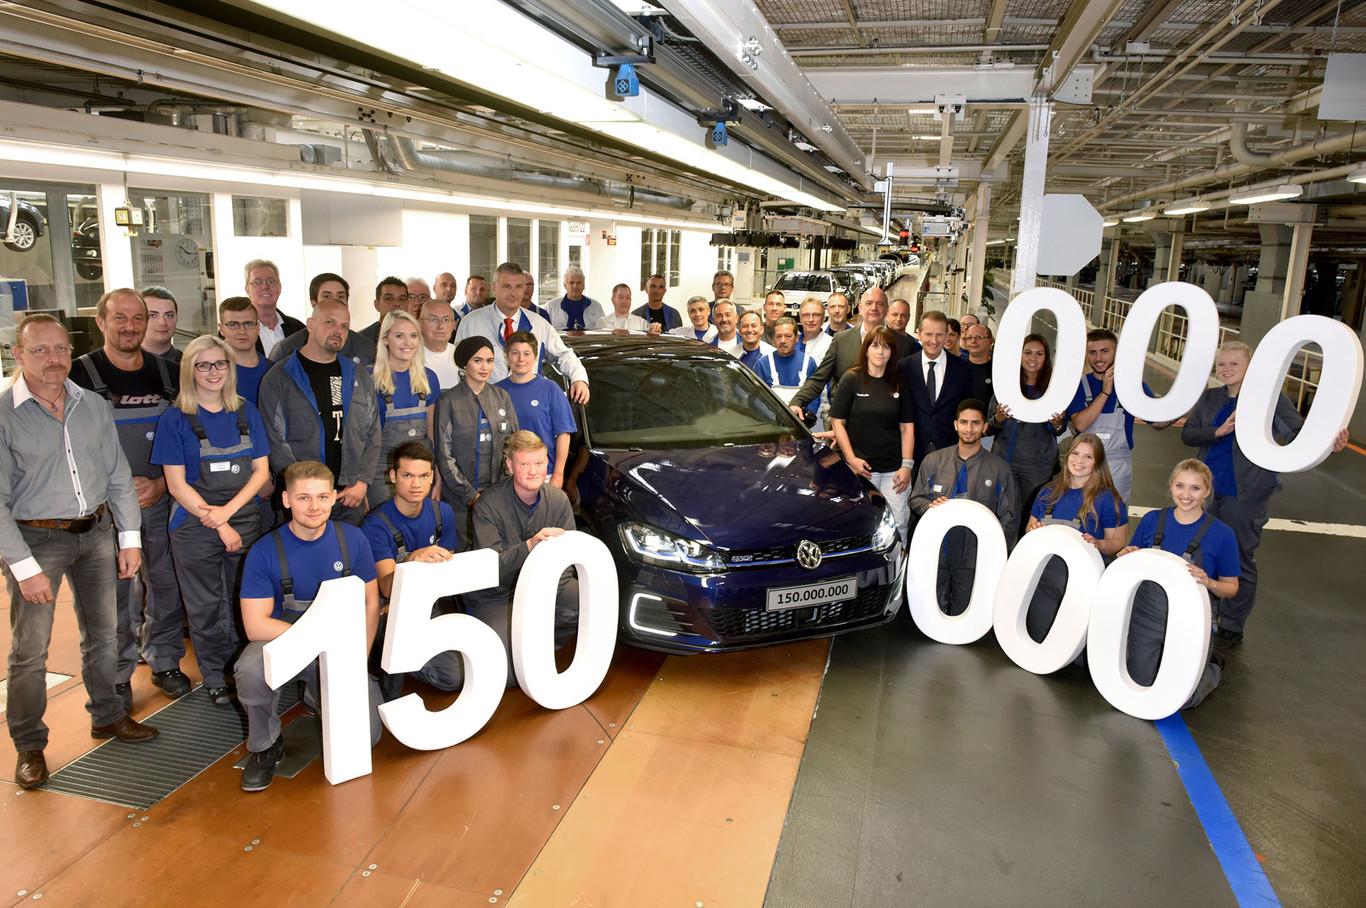 Volkswagen 150 millones unidades